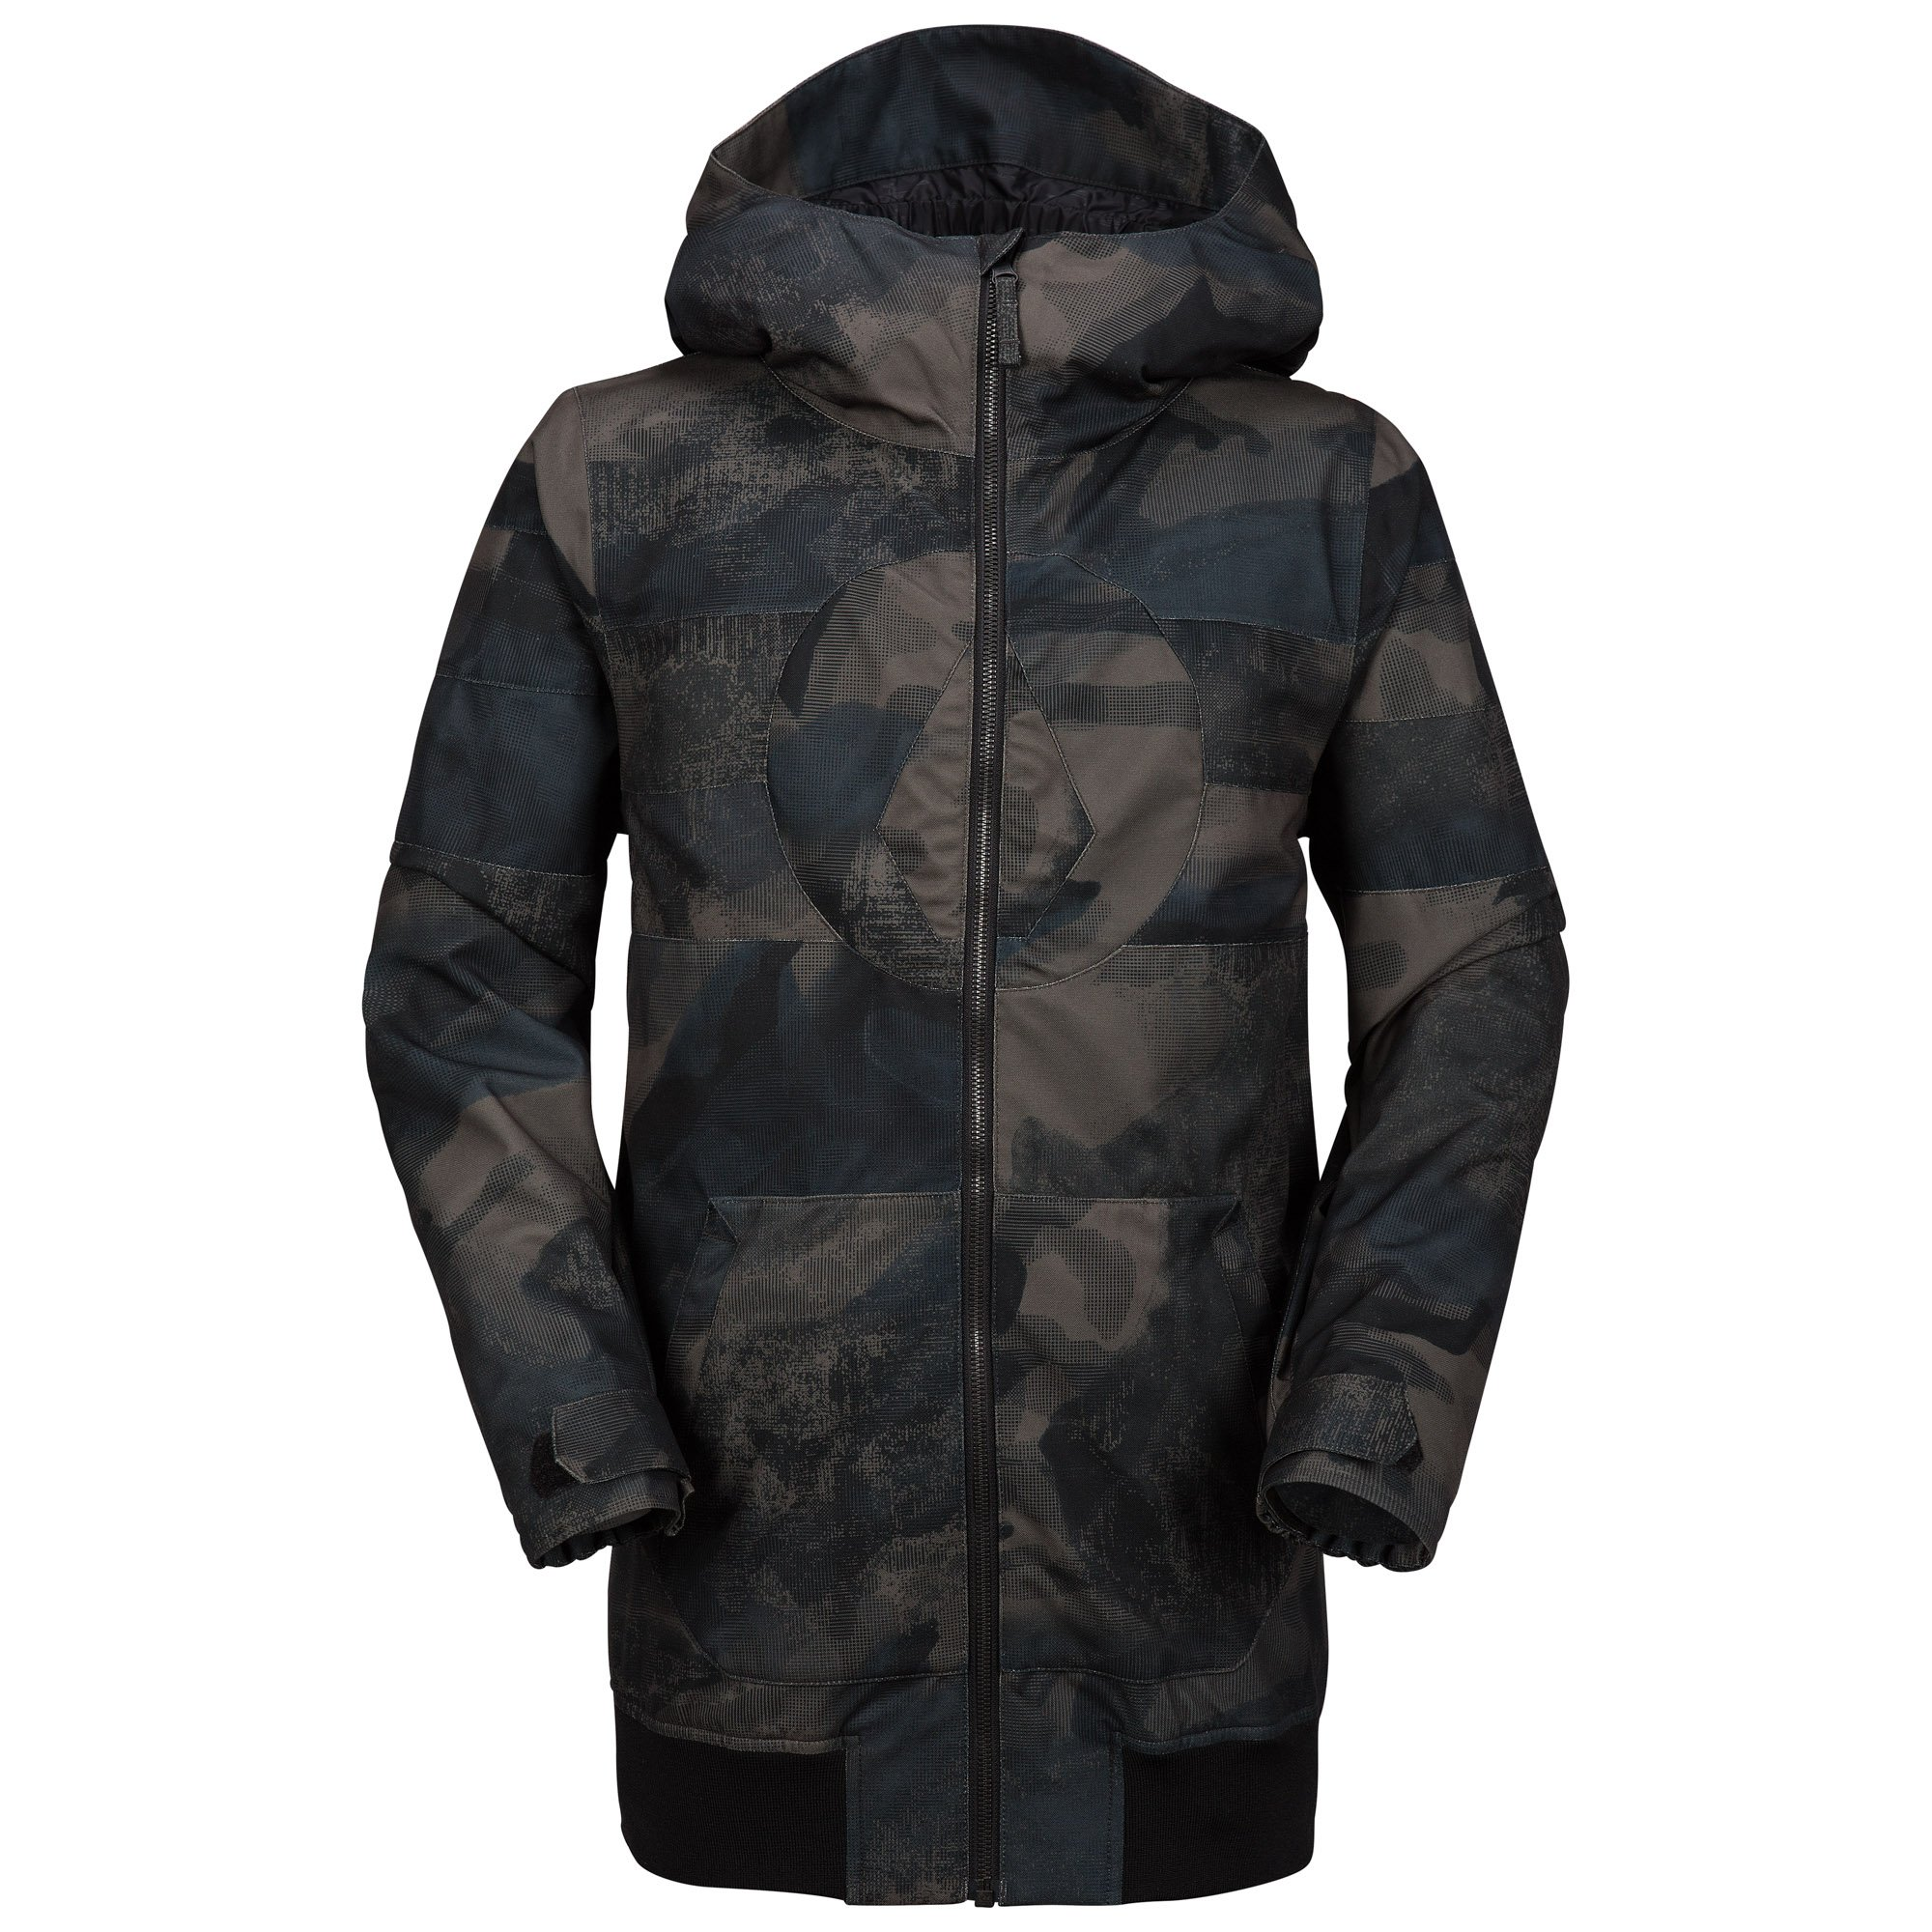 Volcom Big Boys' West Jacket, Camouflage, S